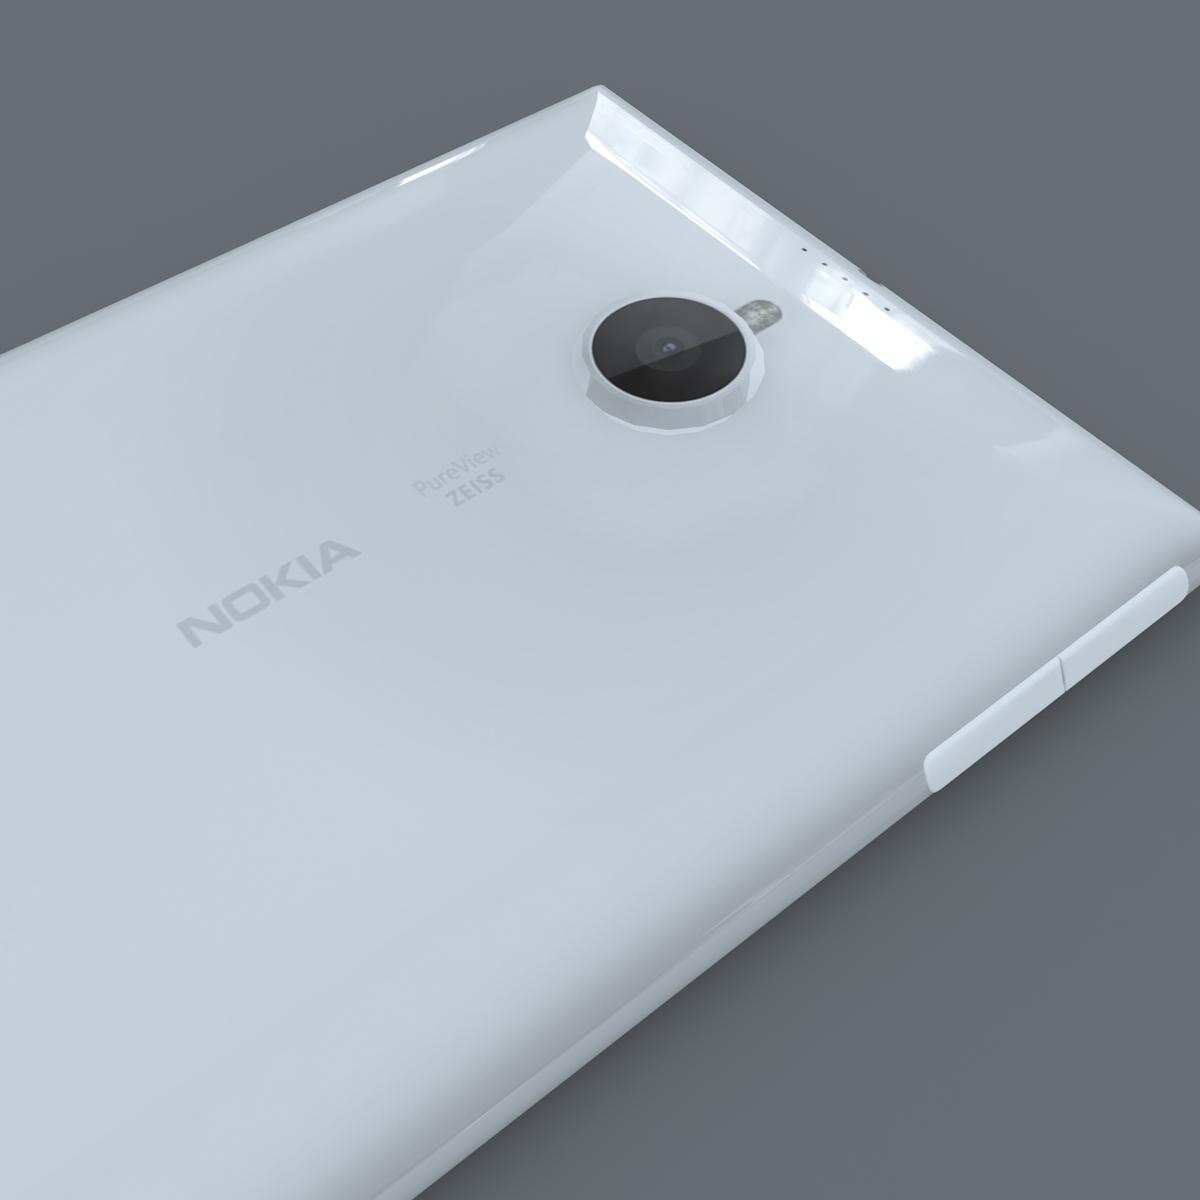 nokia lumia 1520 white 3d model max fbx c4d lxo ma mb obj 158425